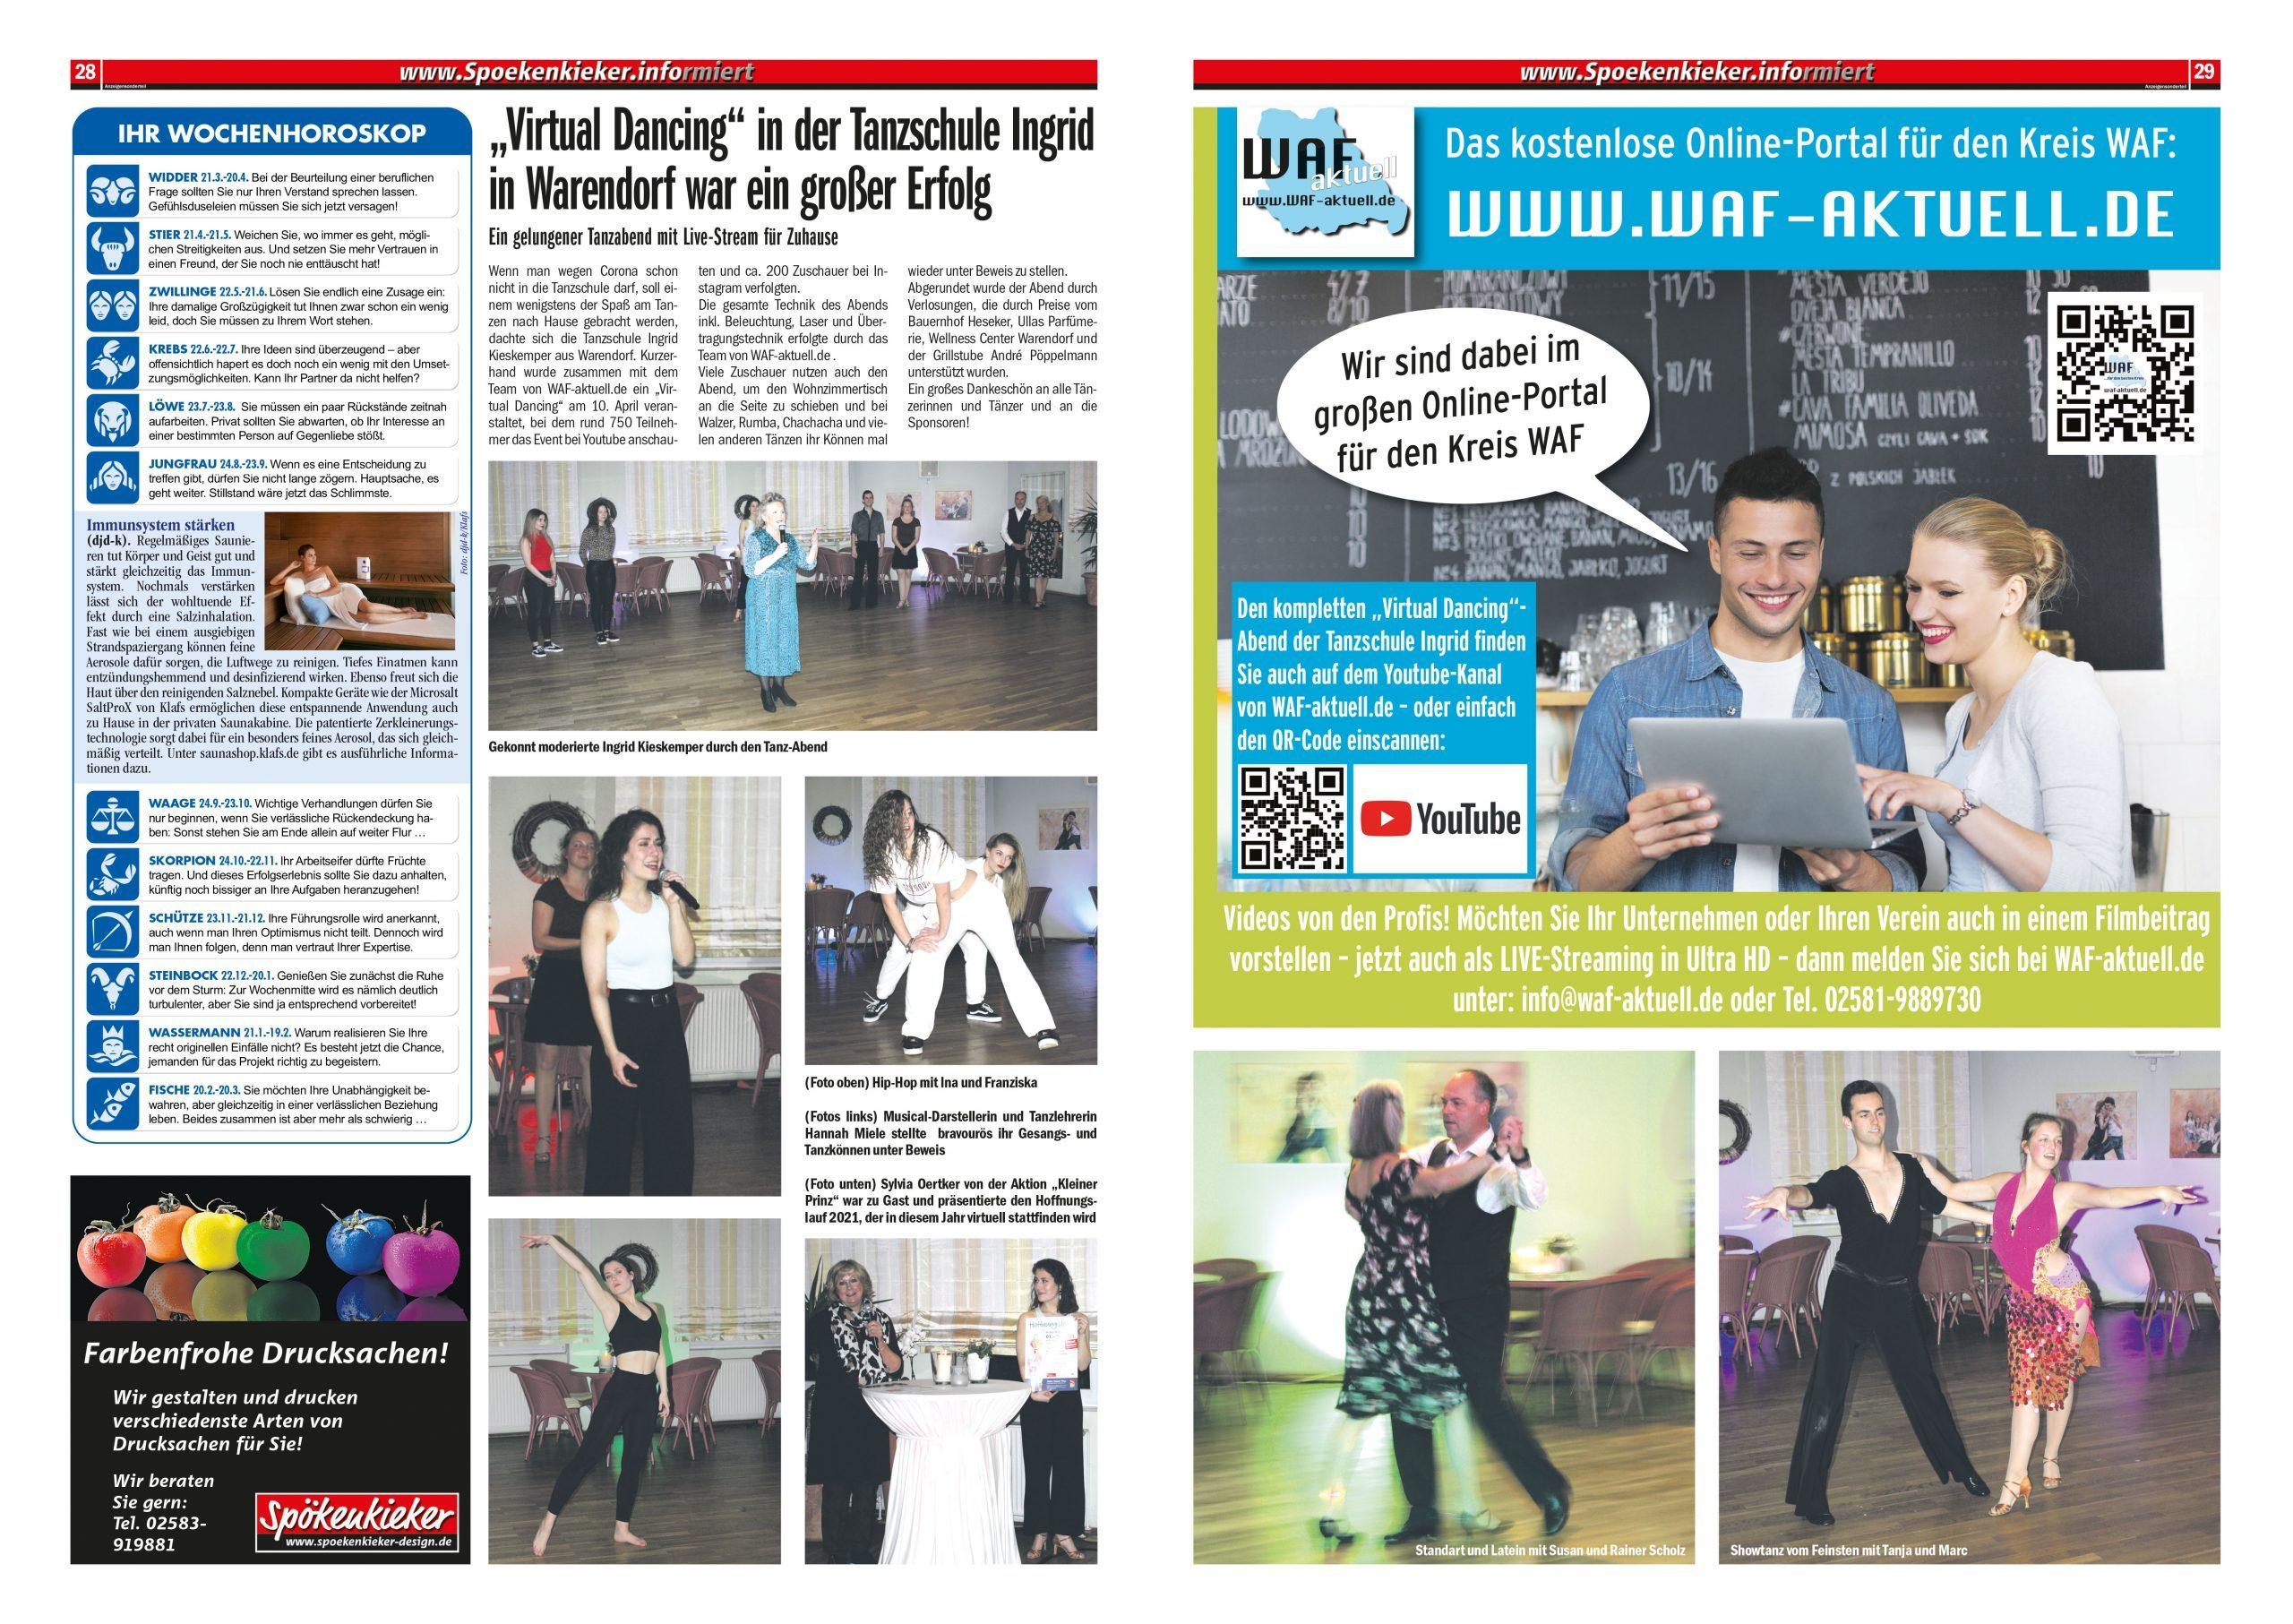 """Virtual Dancing"" in der Tanzschule Ingrid war ein großer Erfolg. VIDEO & Fotostrecke"